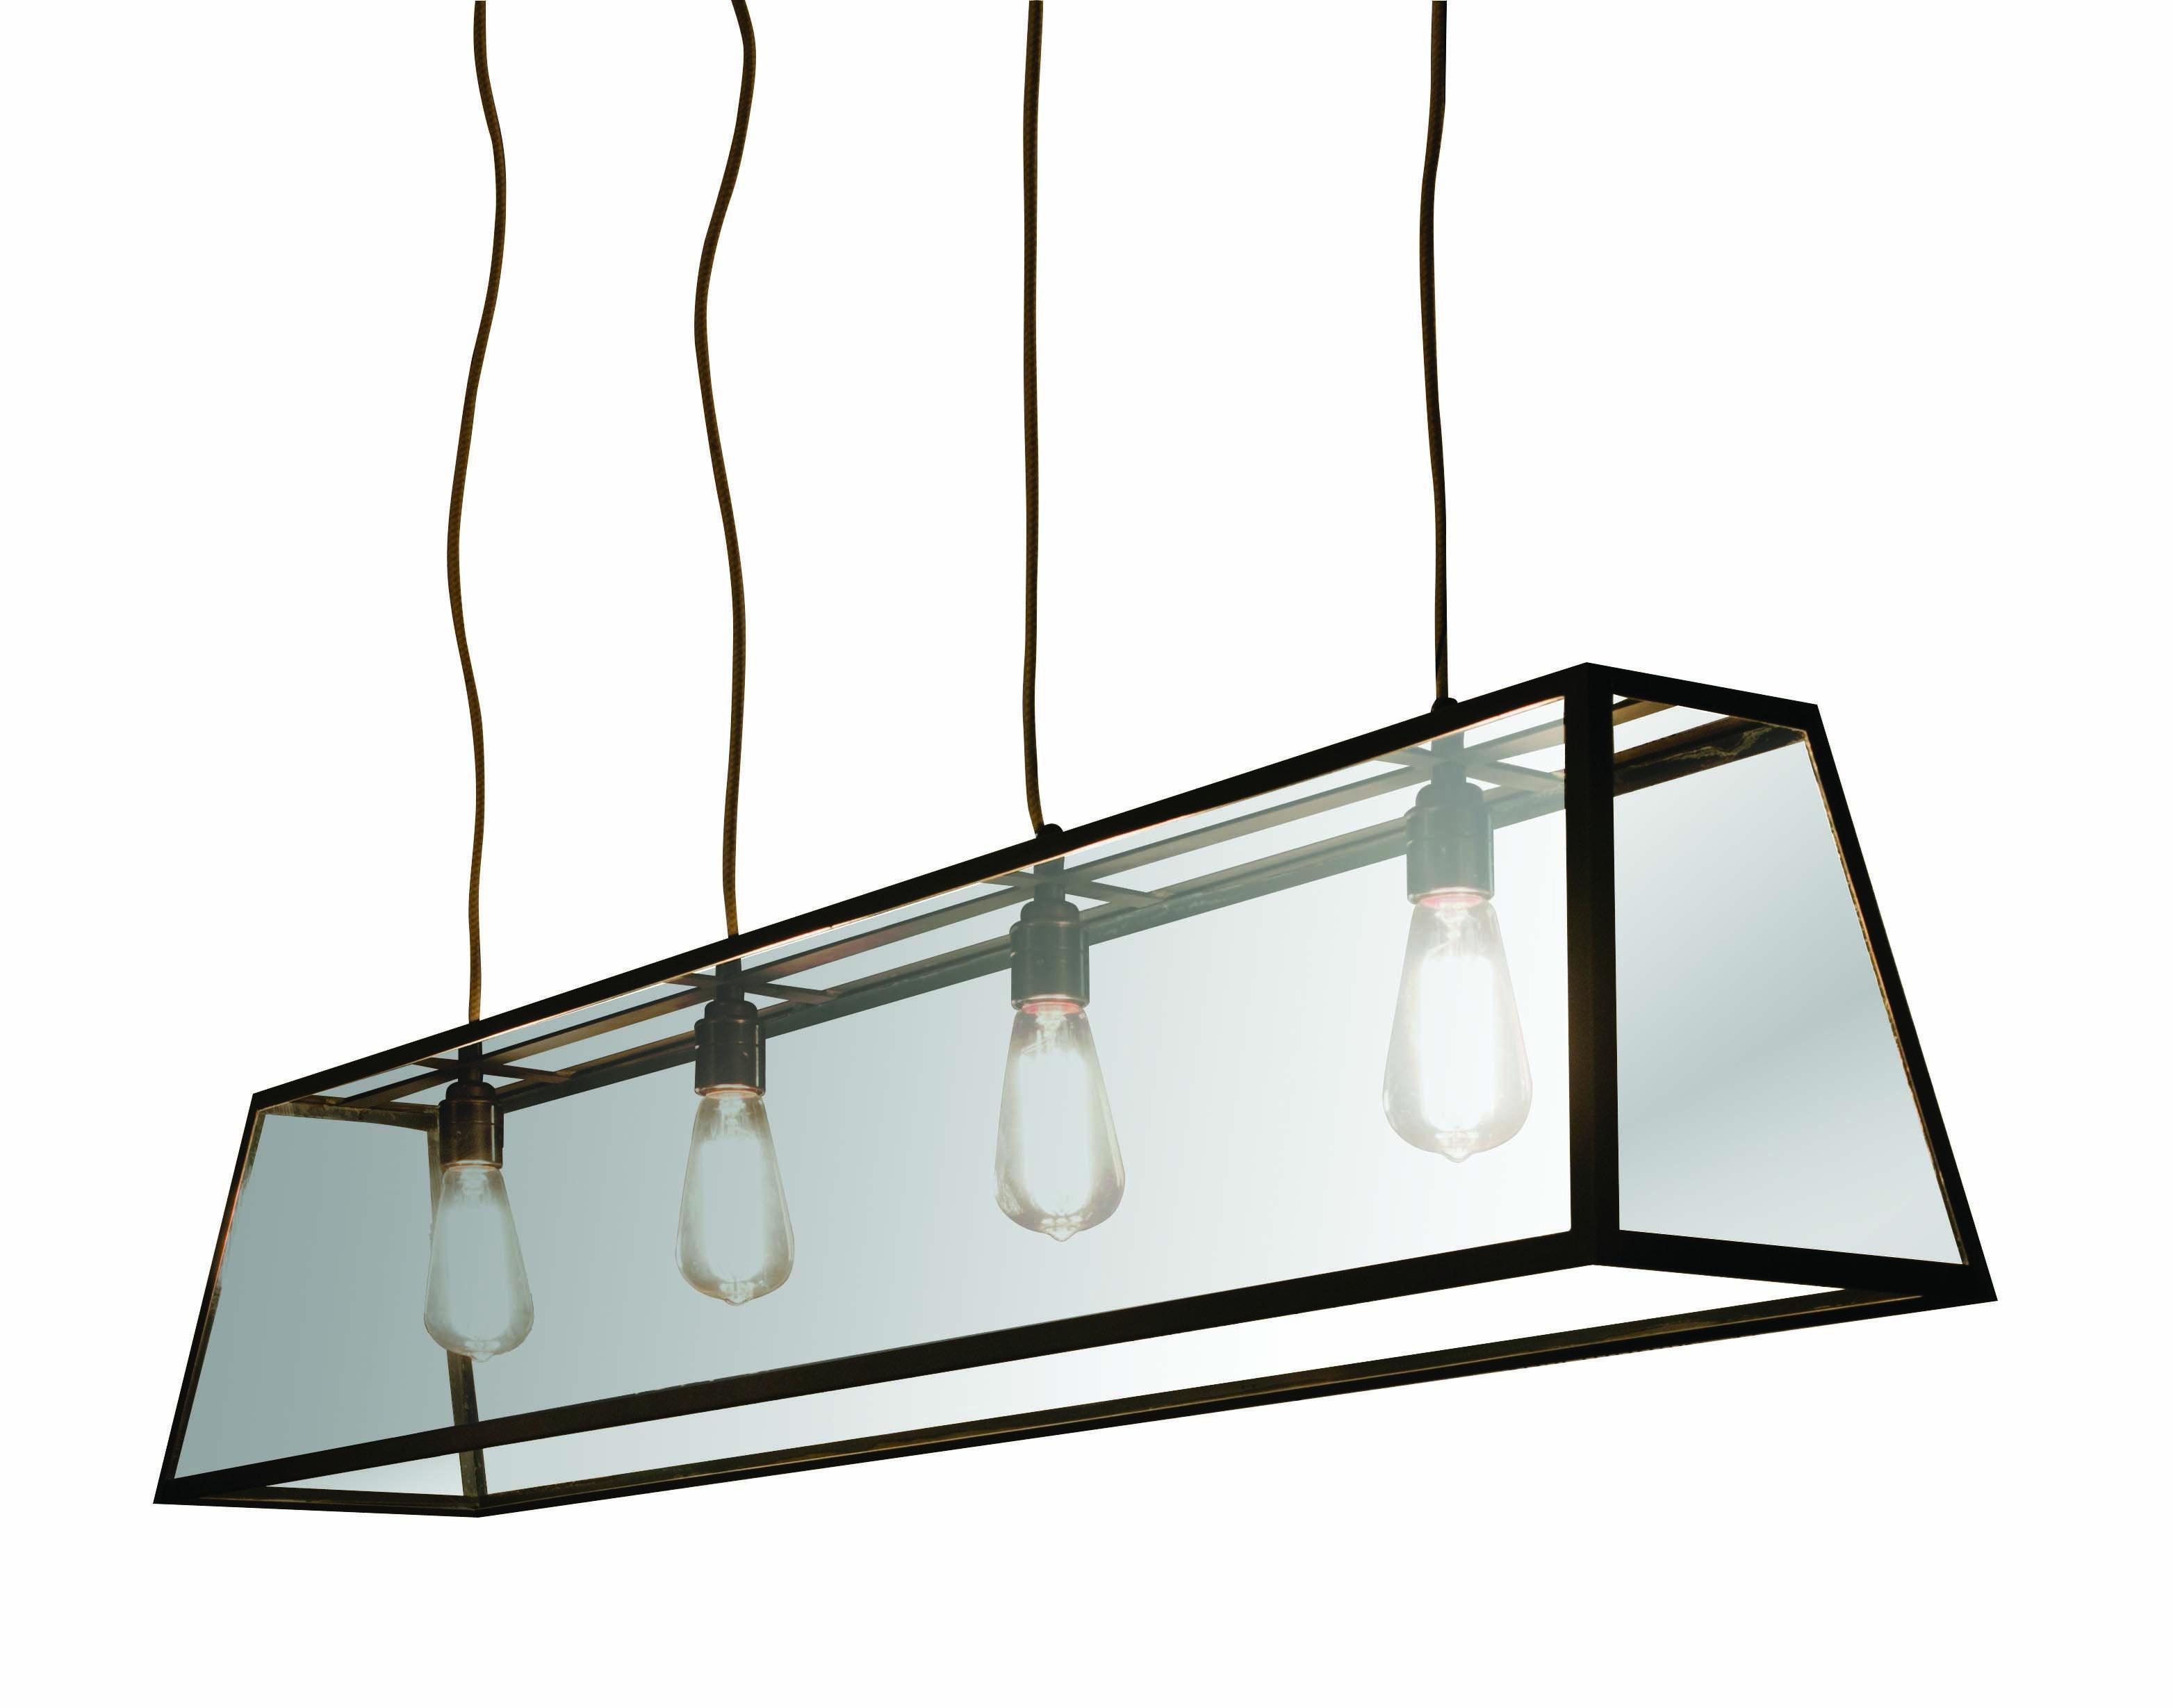 roche bobois roche bobois diner light brass and glass suspension design peter bowles. Black Bedroom Furniture Sets. Home Design Ideas